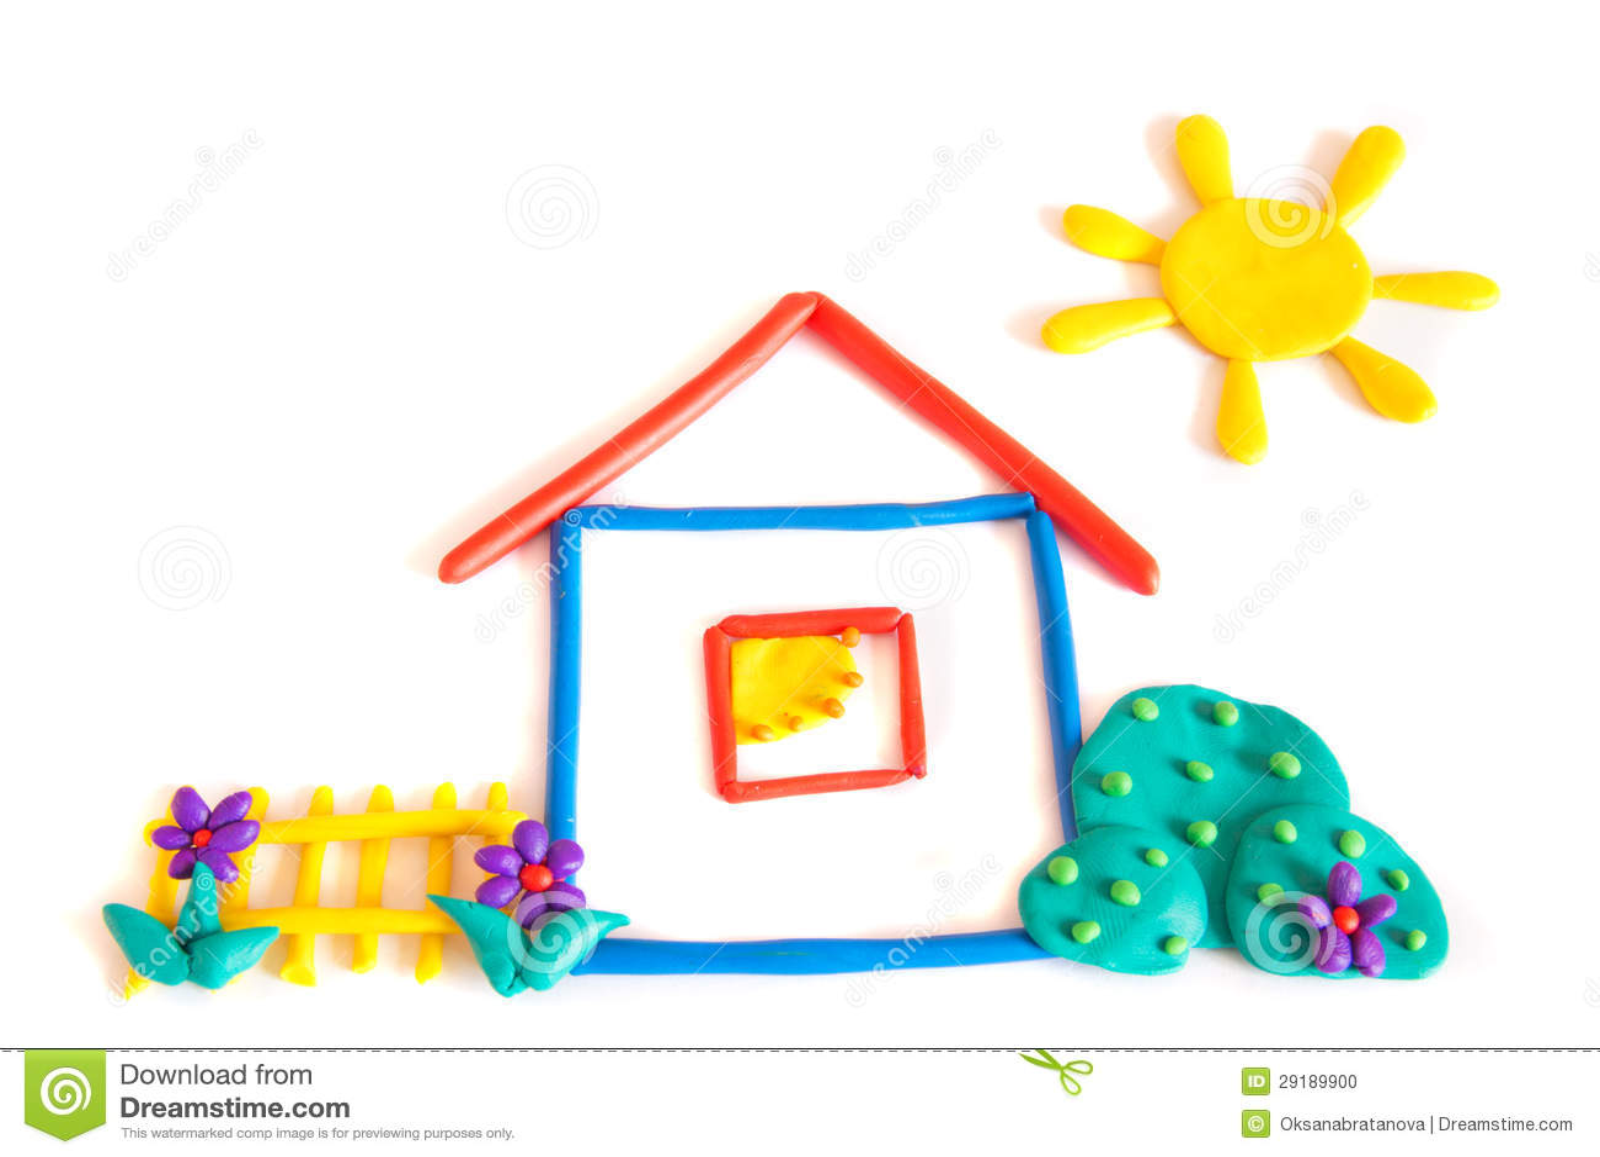 Petite maison de p te modeler photo stock image 29189900 - Pate a modeler maison ...